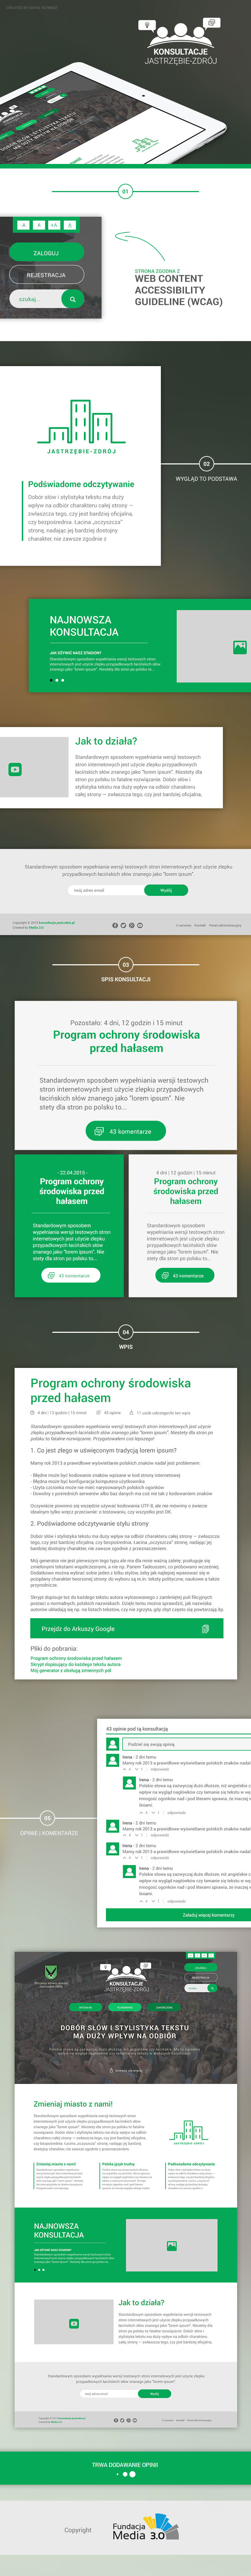 green Web design media new modern minimalist site